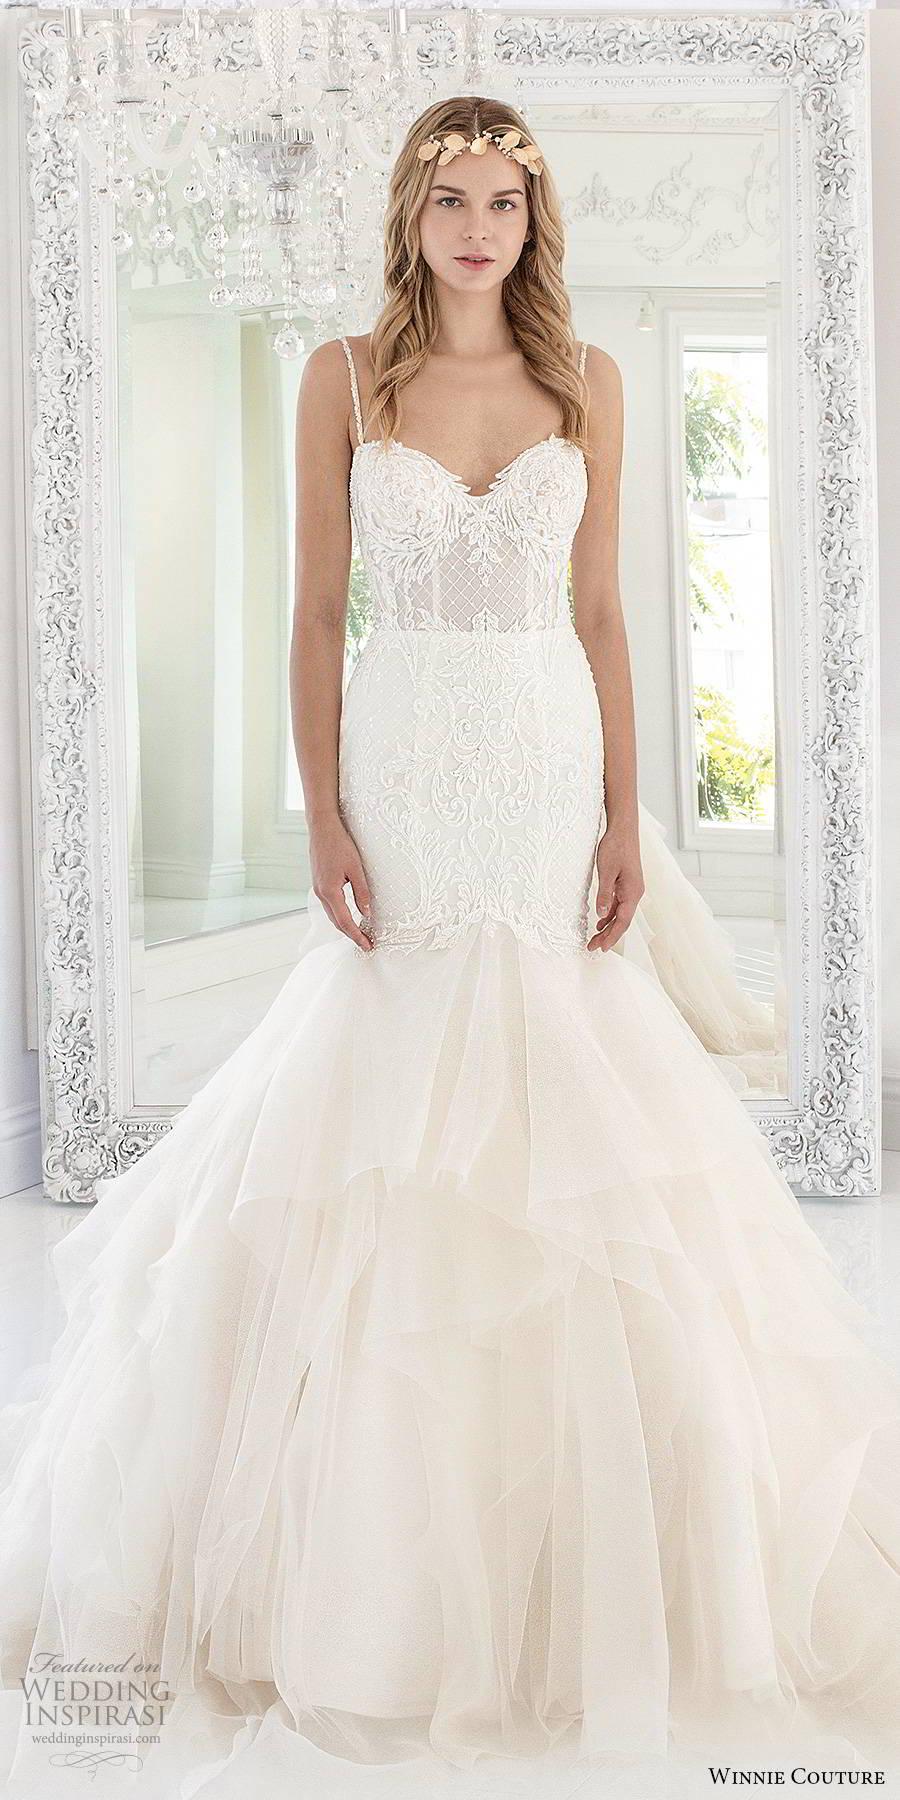 winnie couture 2019 bridal sleeveless thin straps sweetheart neckline tiered skirt romantic fit flare mermaid wedding dress (9) mv